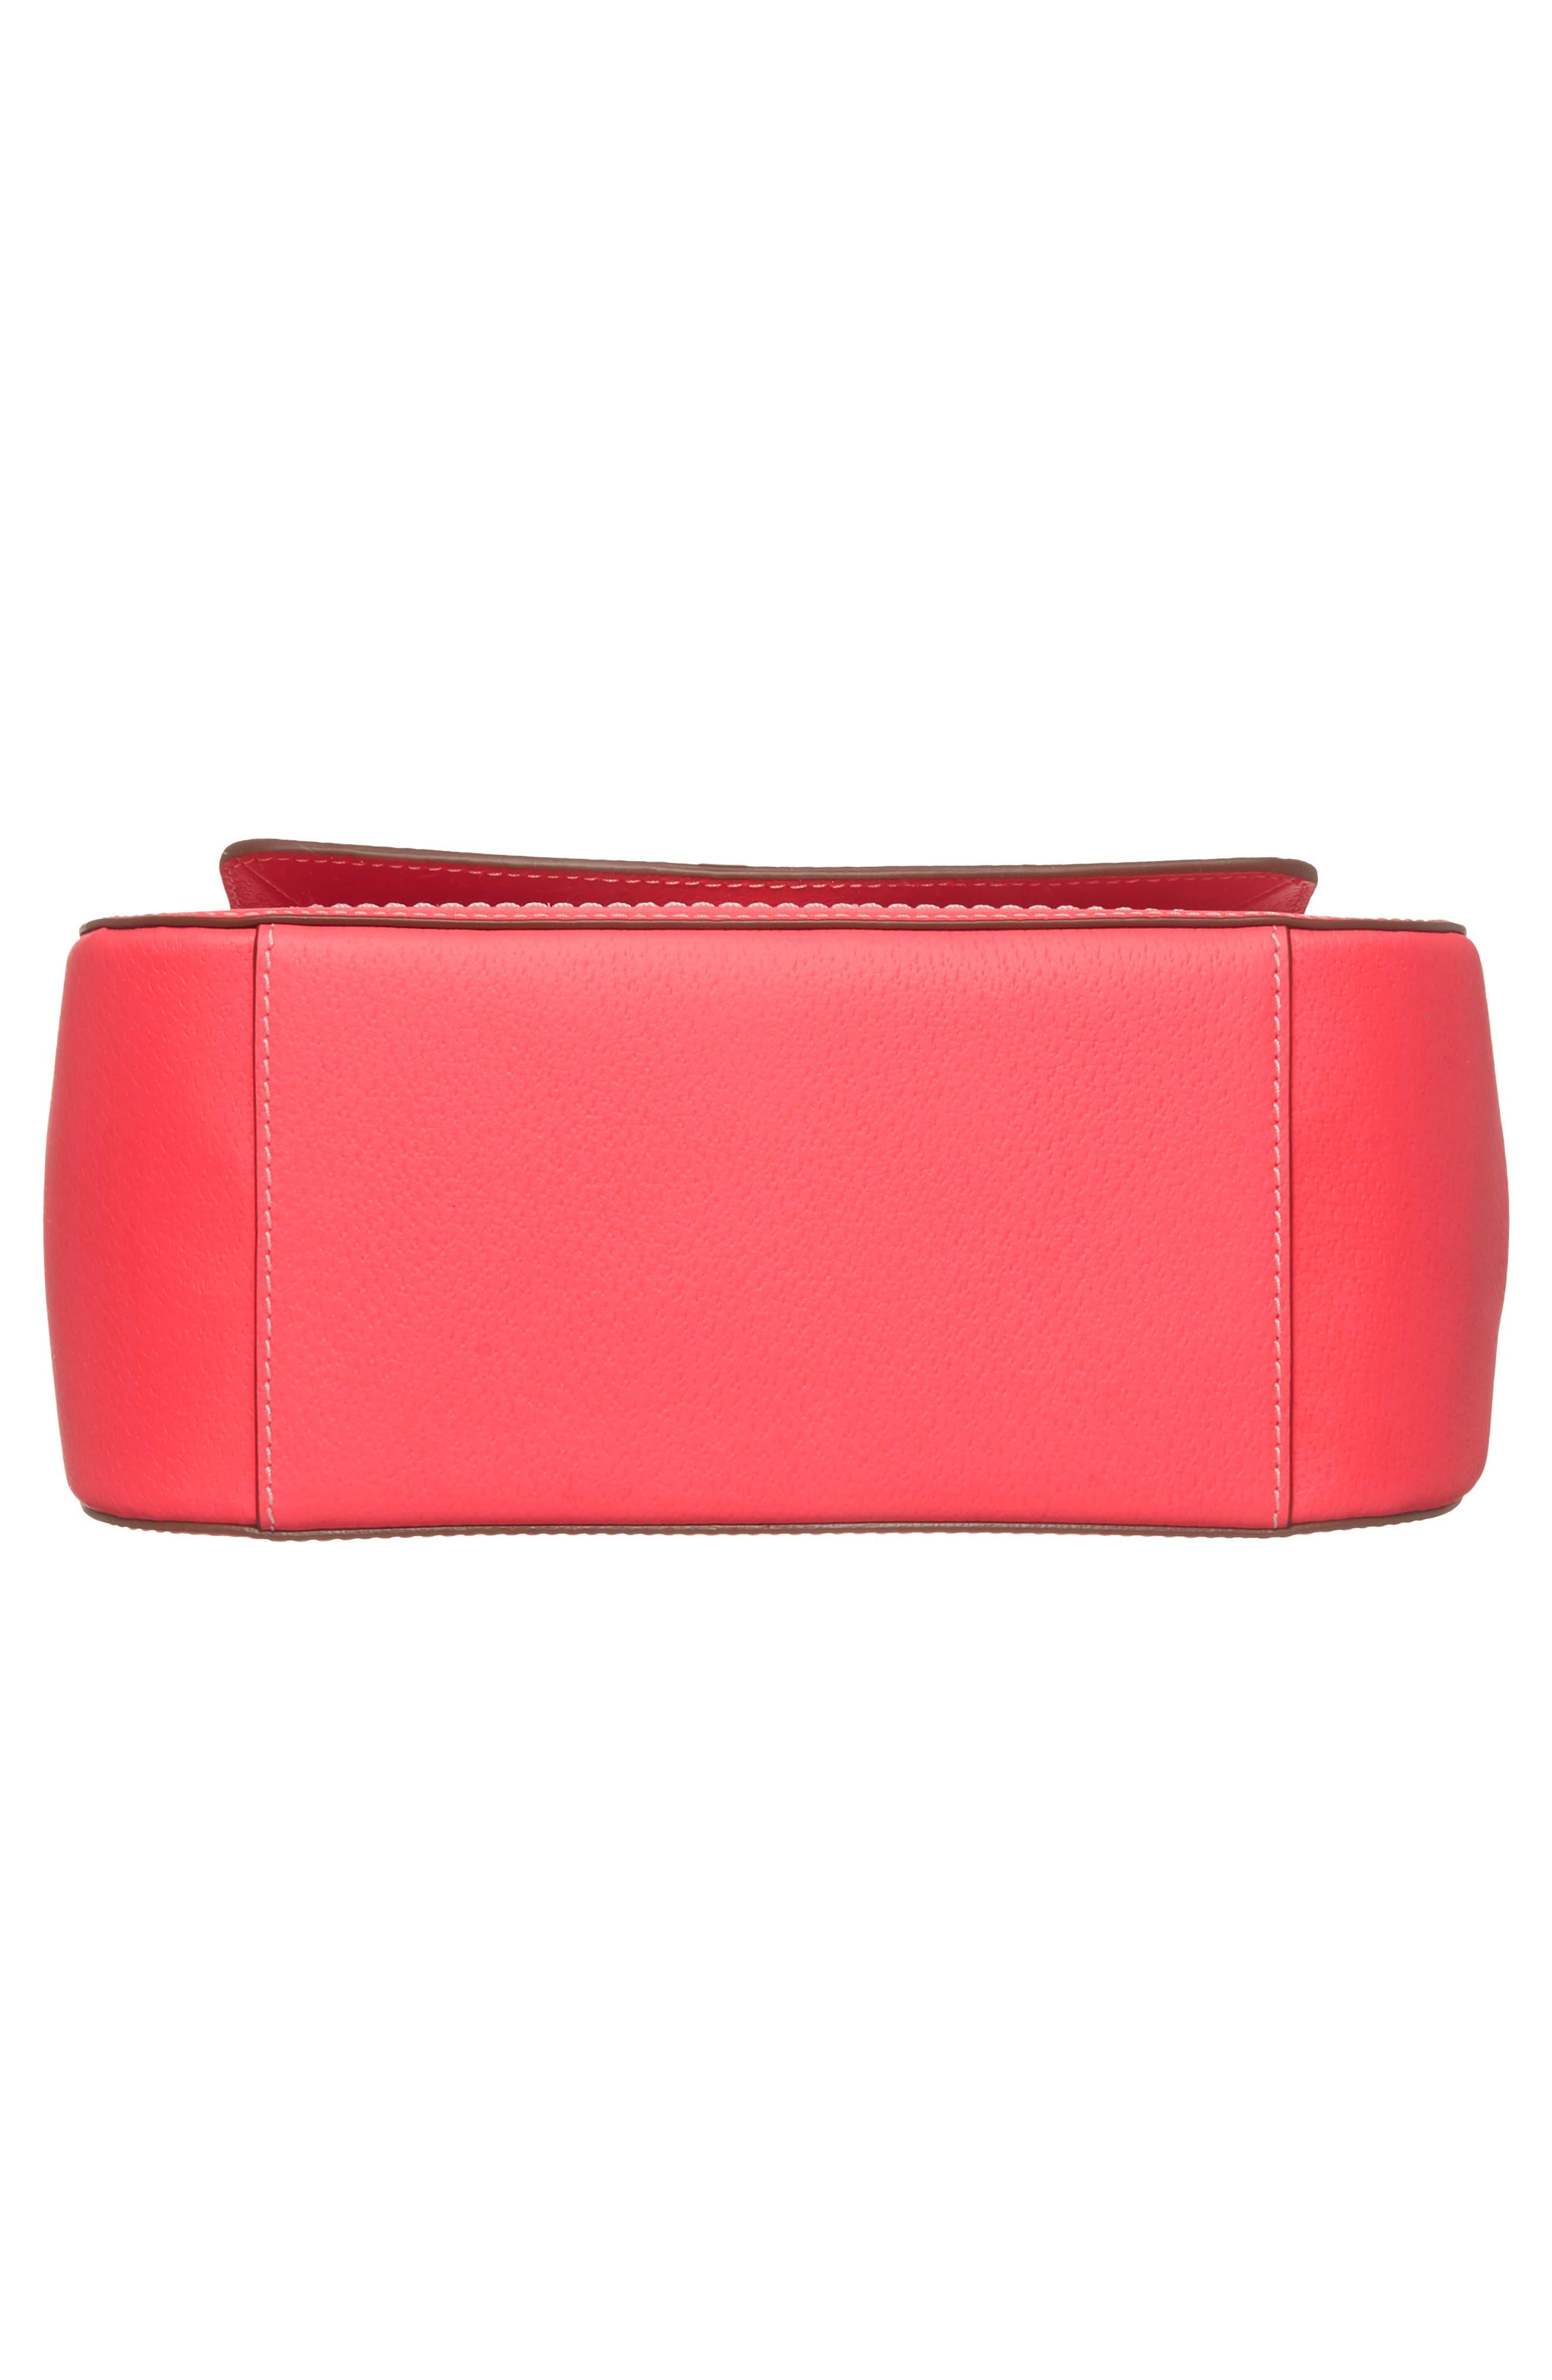 thompson street - justina leather satchel,                             Alternate thumbnail 6, color,                             650